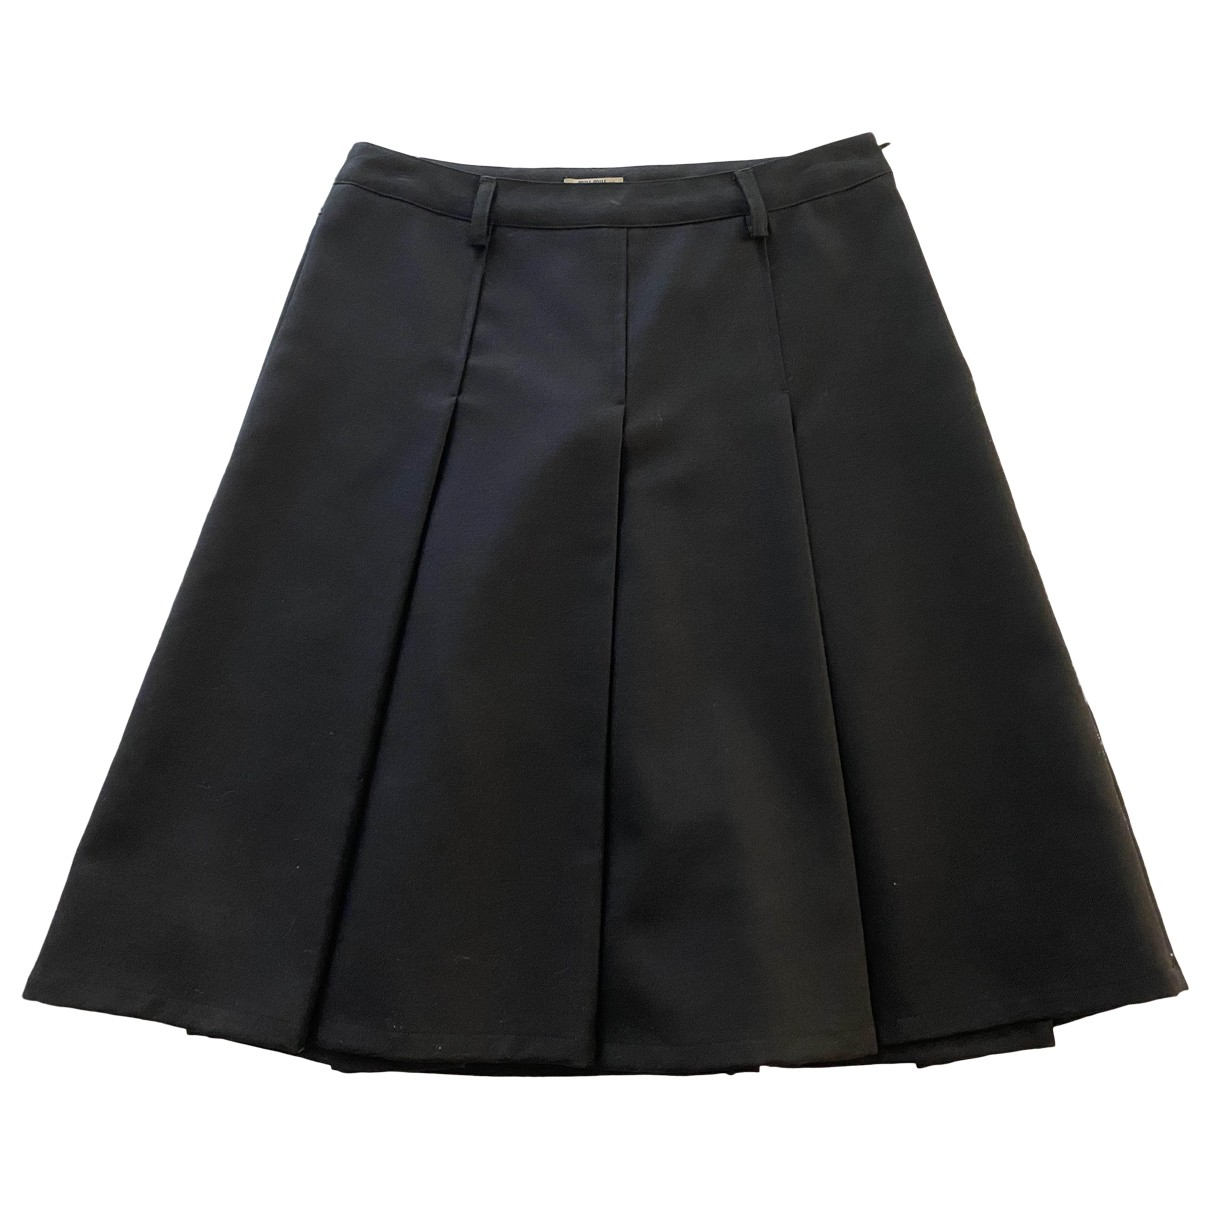 Miu Miu \N Black Wool skirt for Women 40 IT